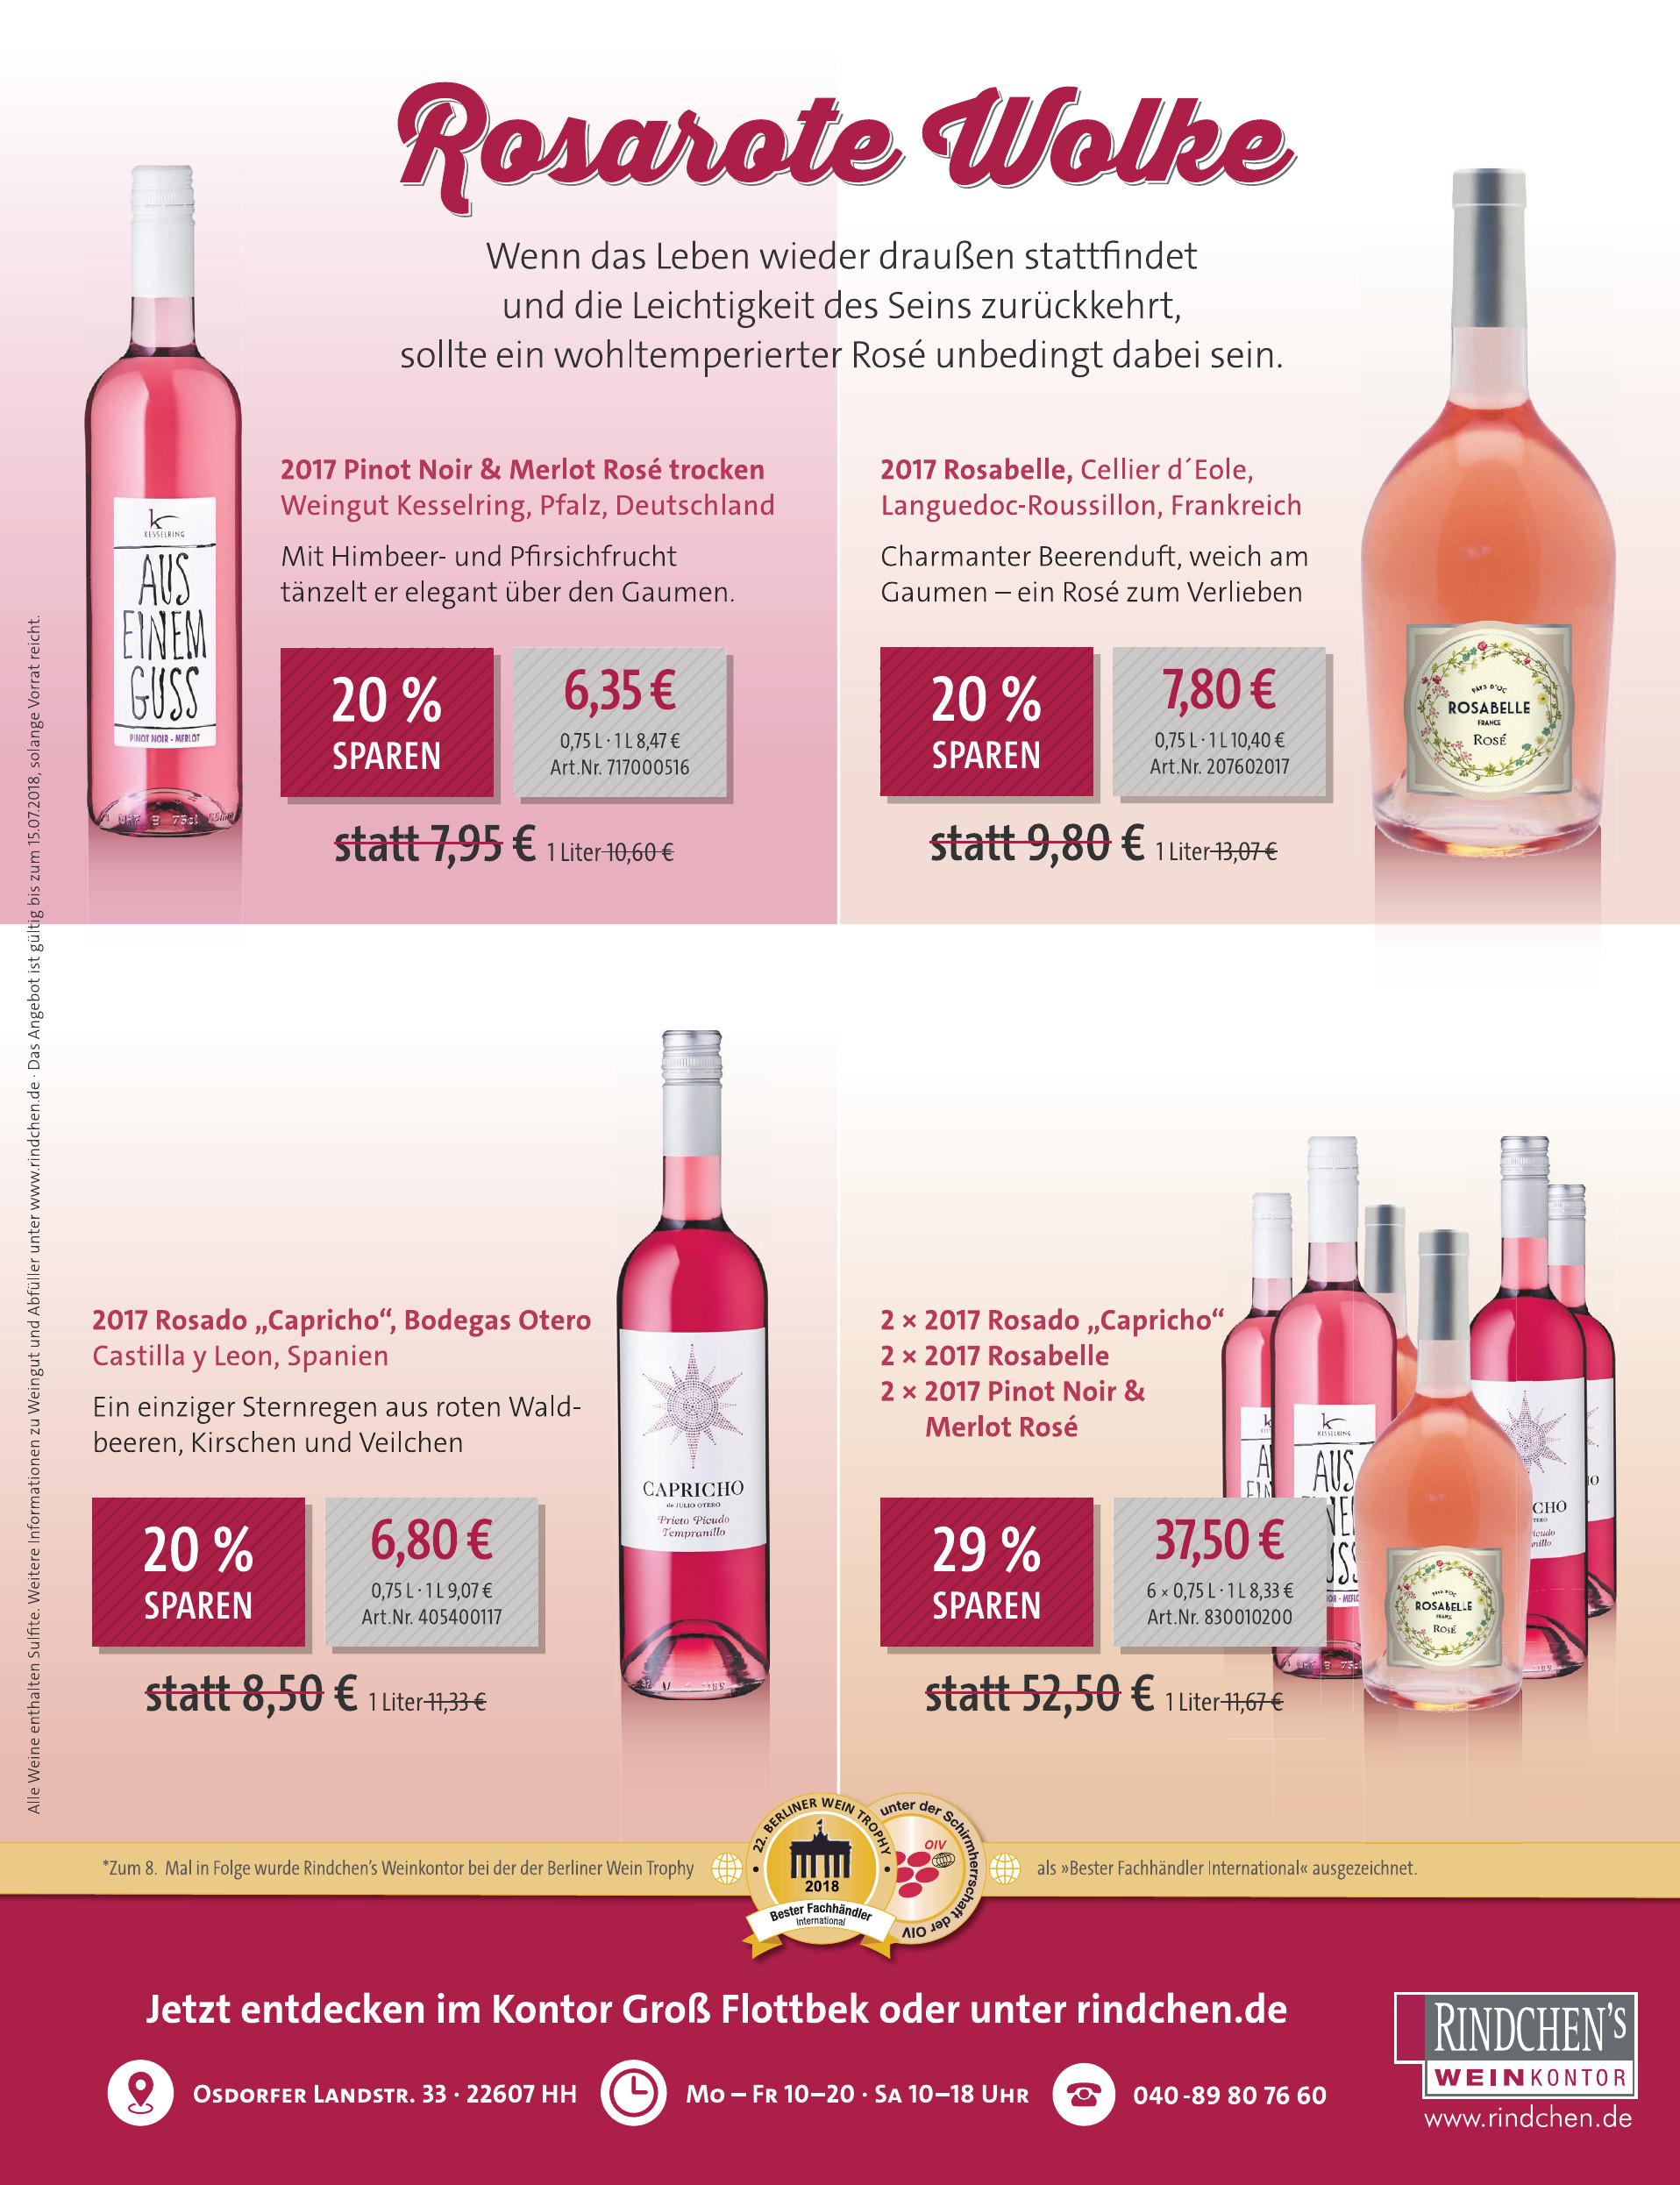 Rindchen´s Weinkontor - Kontor Groß Flottbek